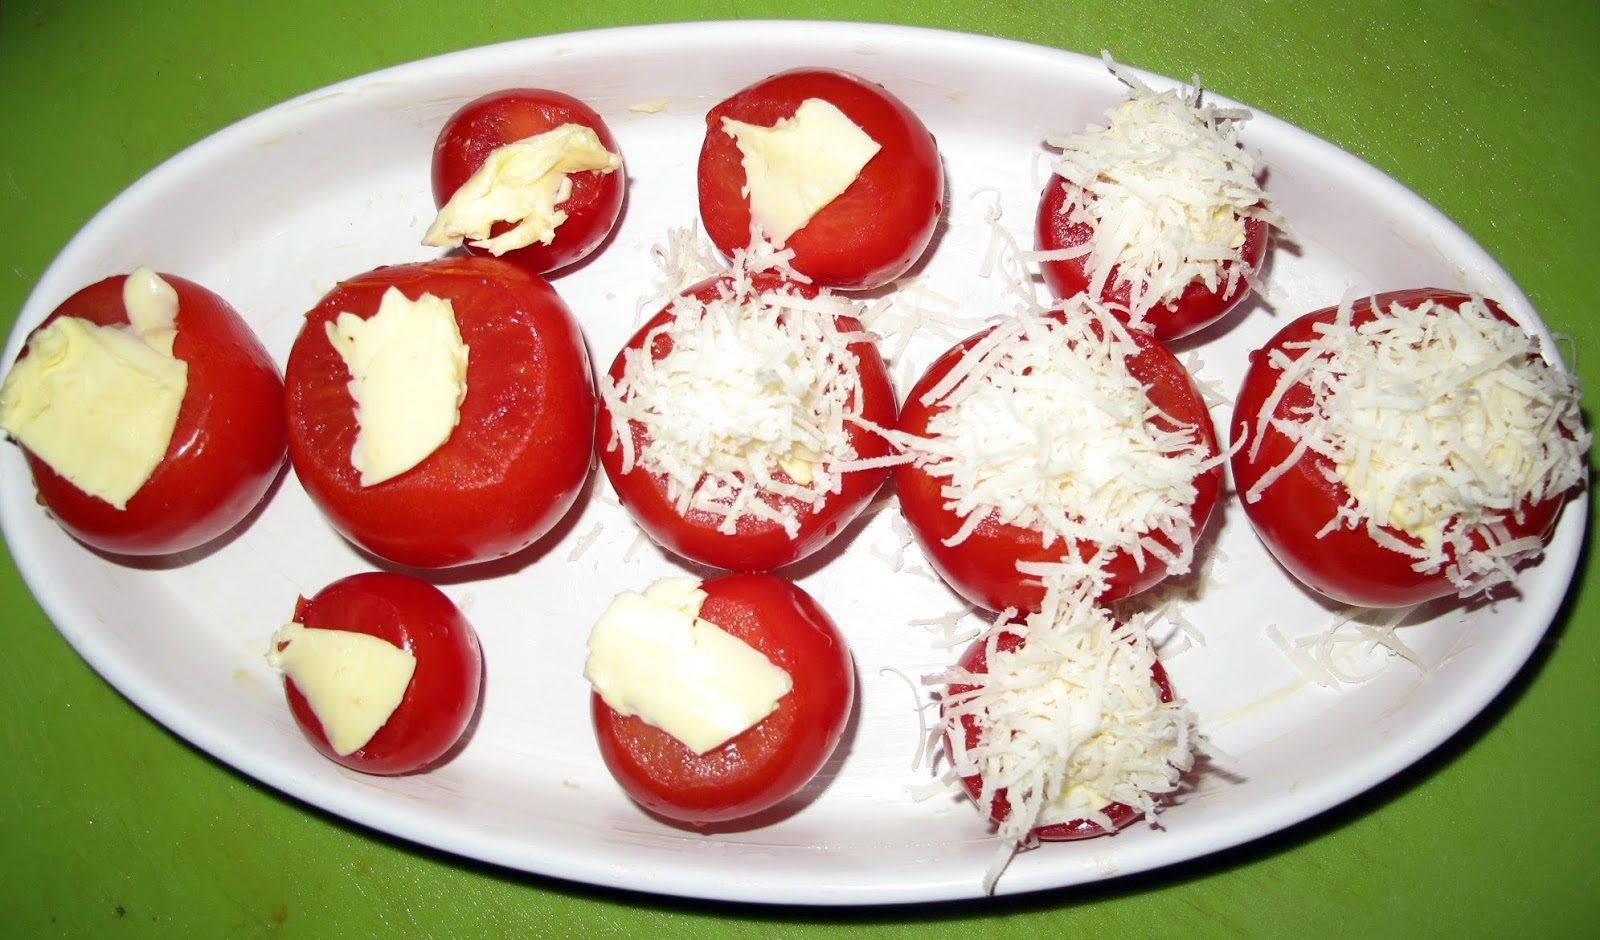 gebackene tomaten mit parmesan amallias kreation. Black Bedroom Furniture Sets. Home Design Ideas